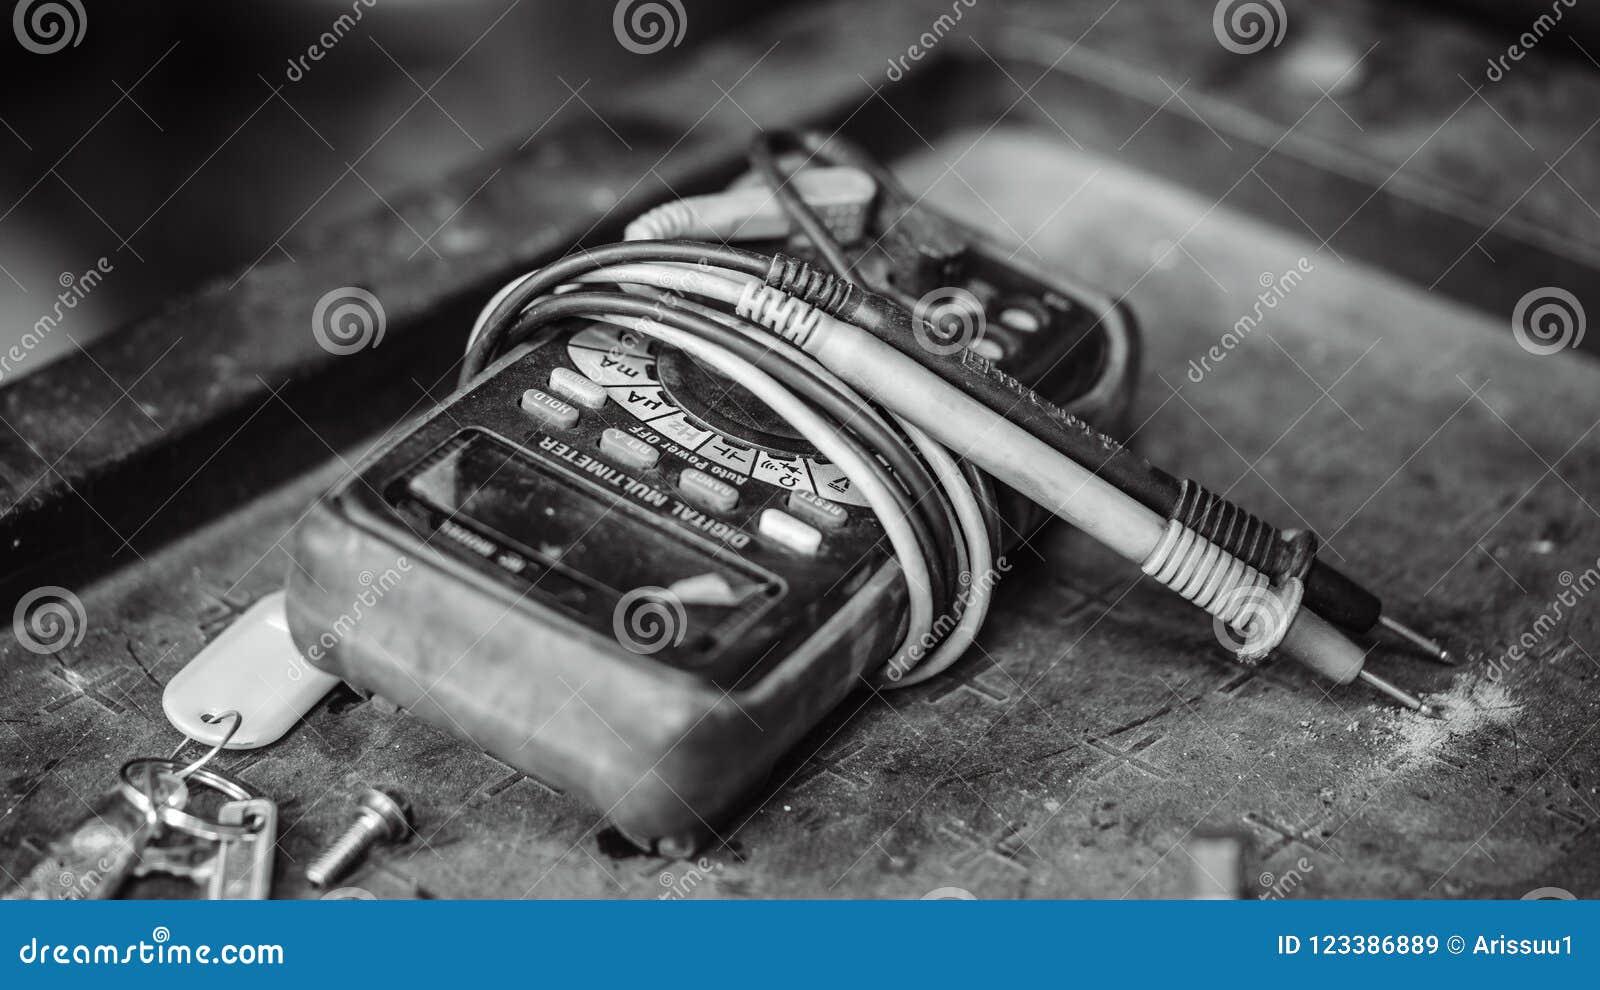 Electrical Digital Multimeter Indicator Device